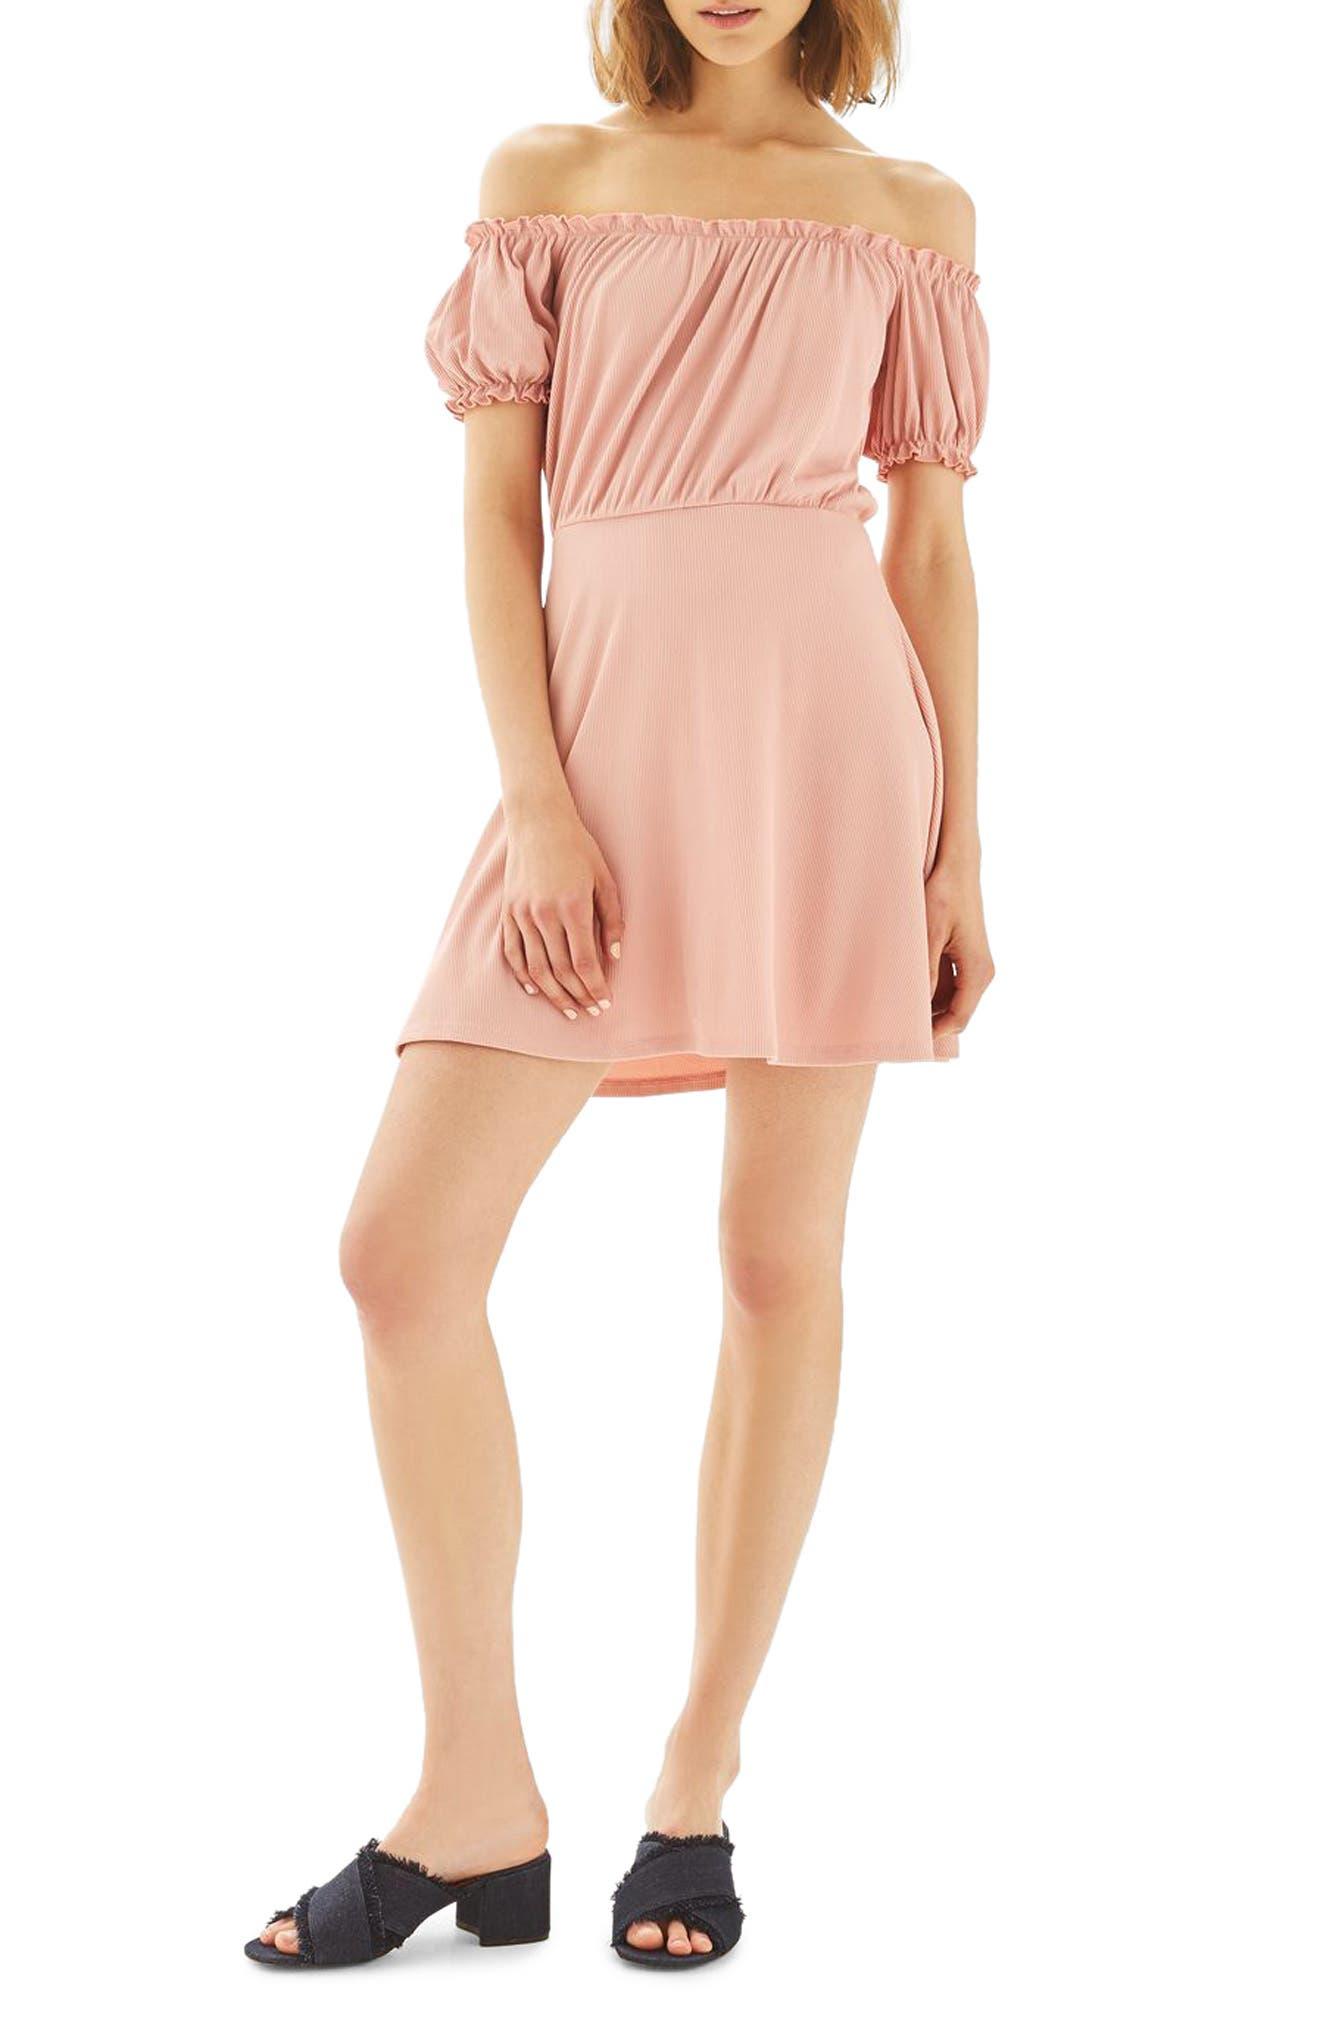 Topshop Bardot Skater Dress